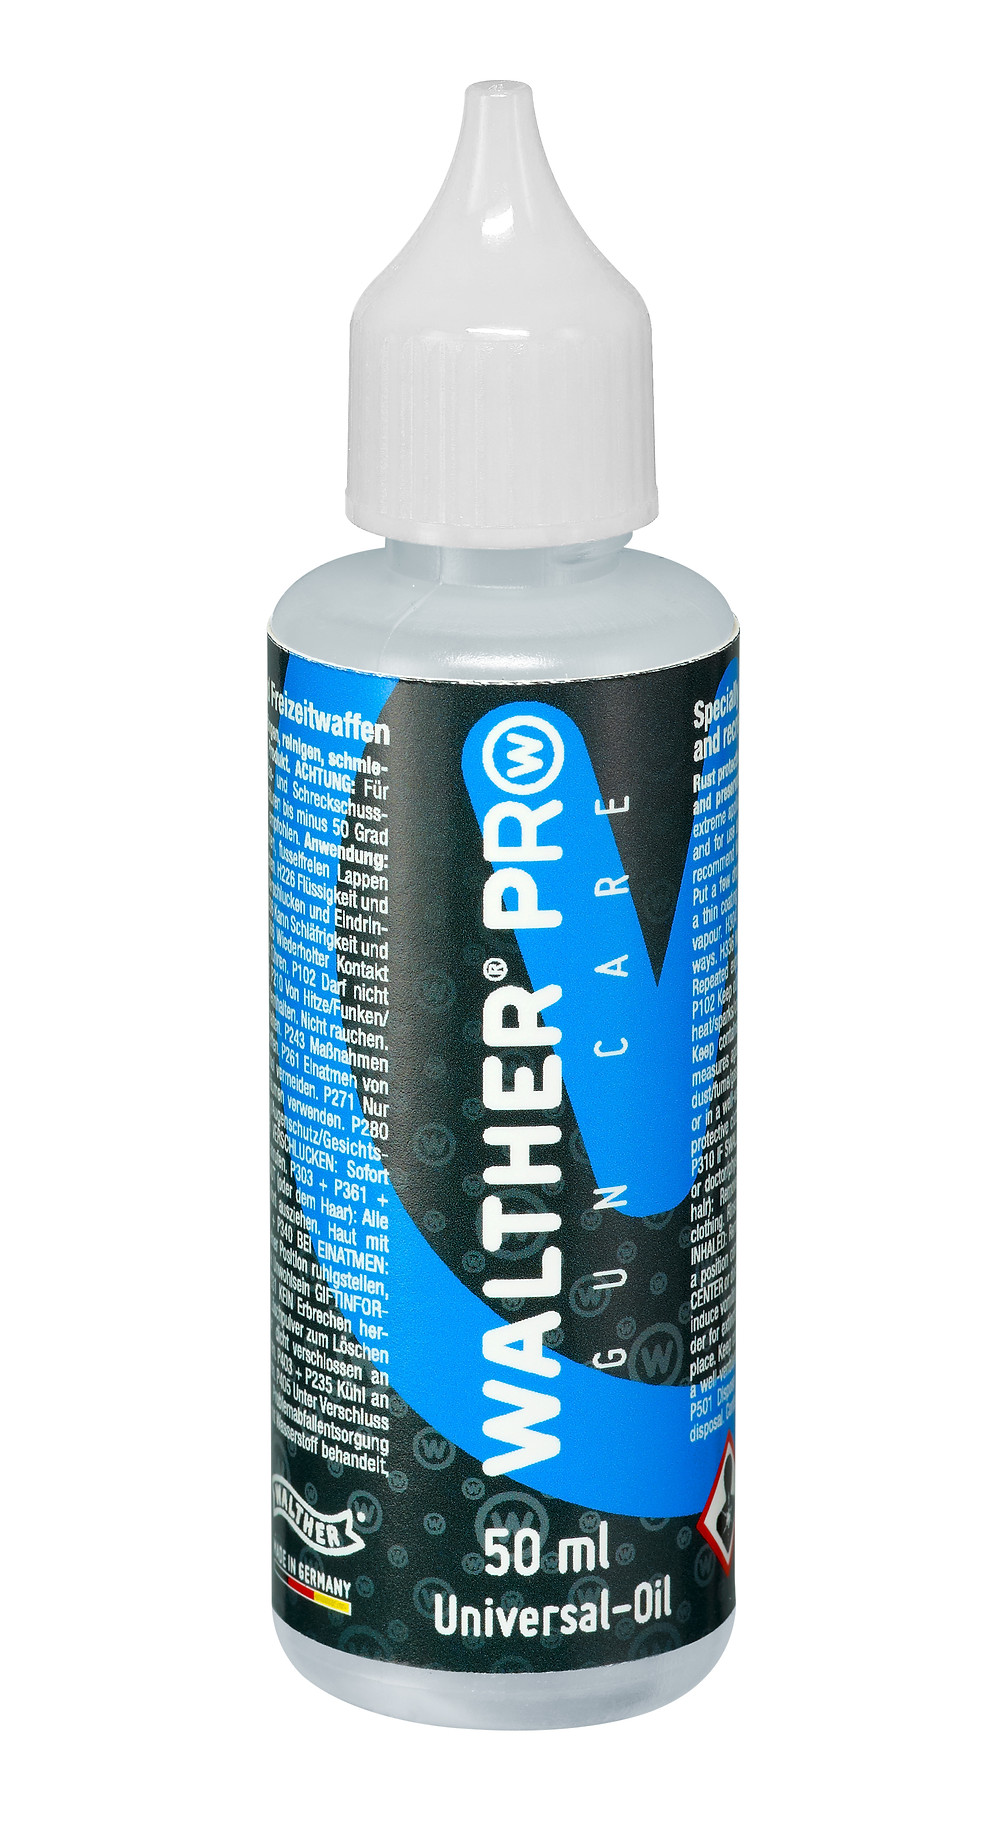 Walther Pro Gun Care Universal Öl 50 ml